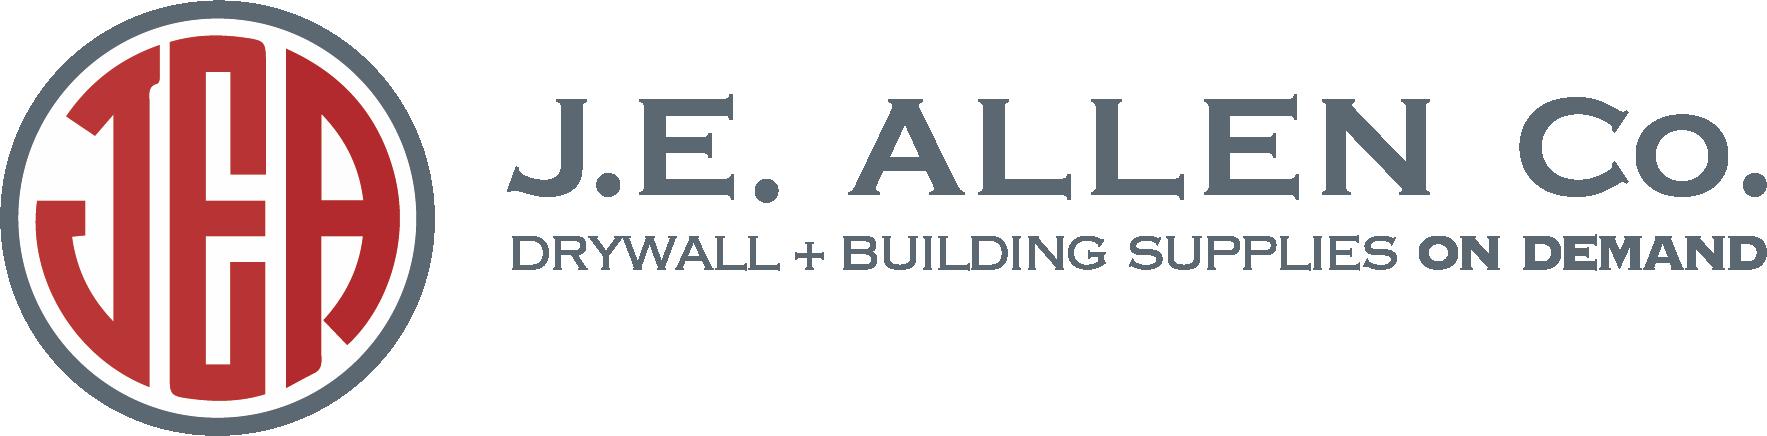 J.E. ALLEN CO